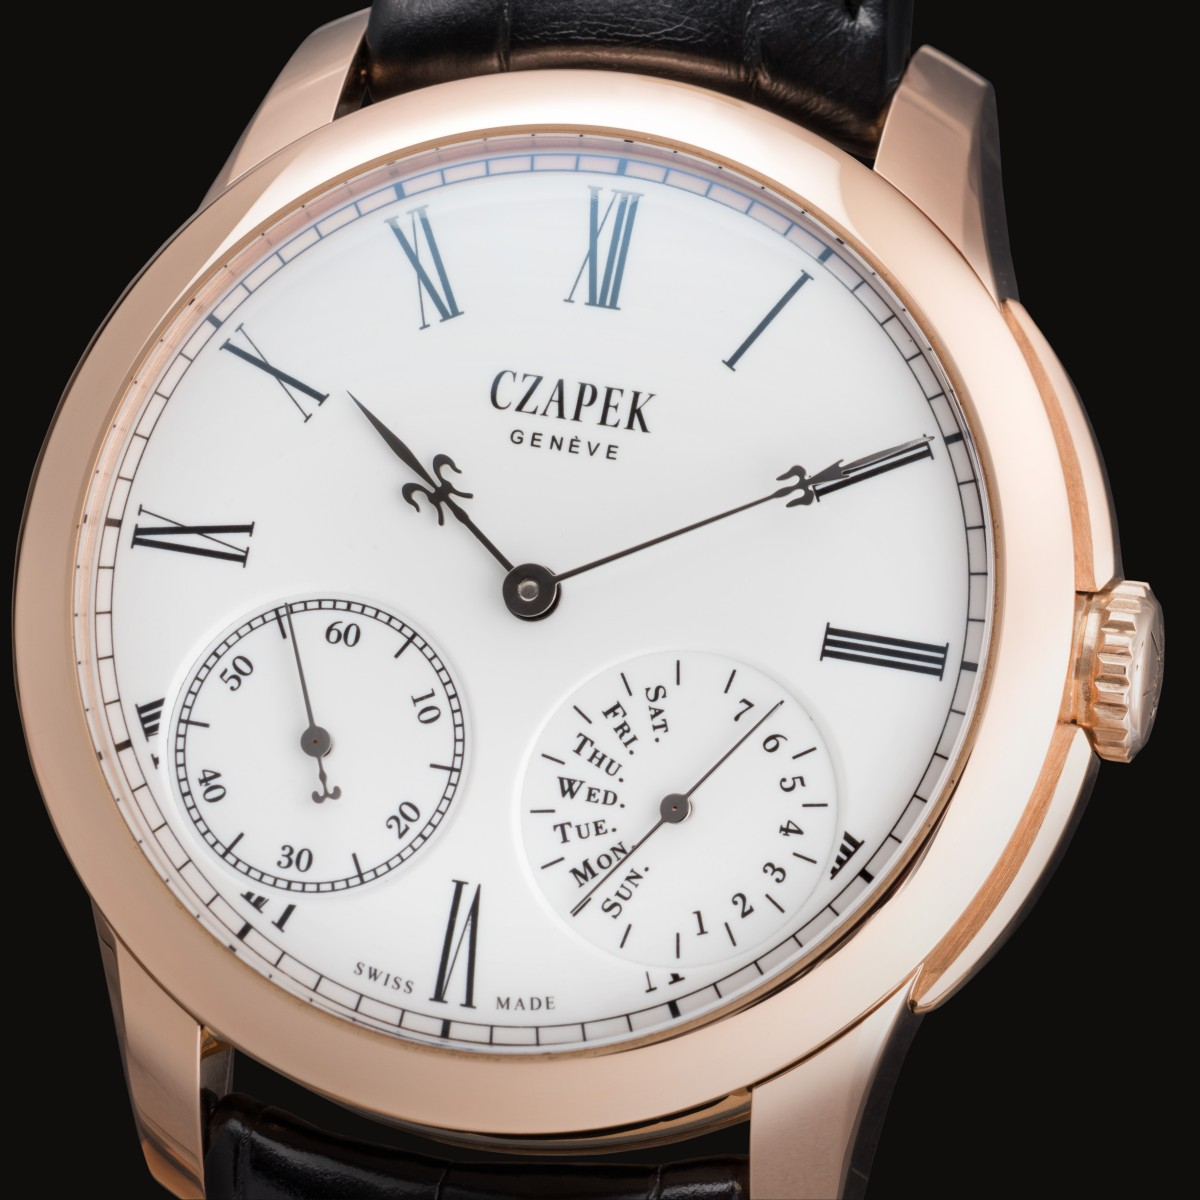 Czapek QdB N°33 lys or noir dial